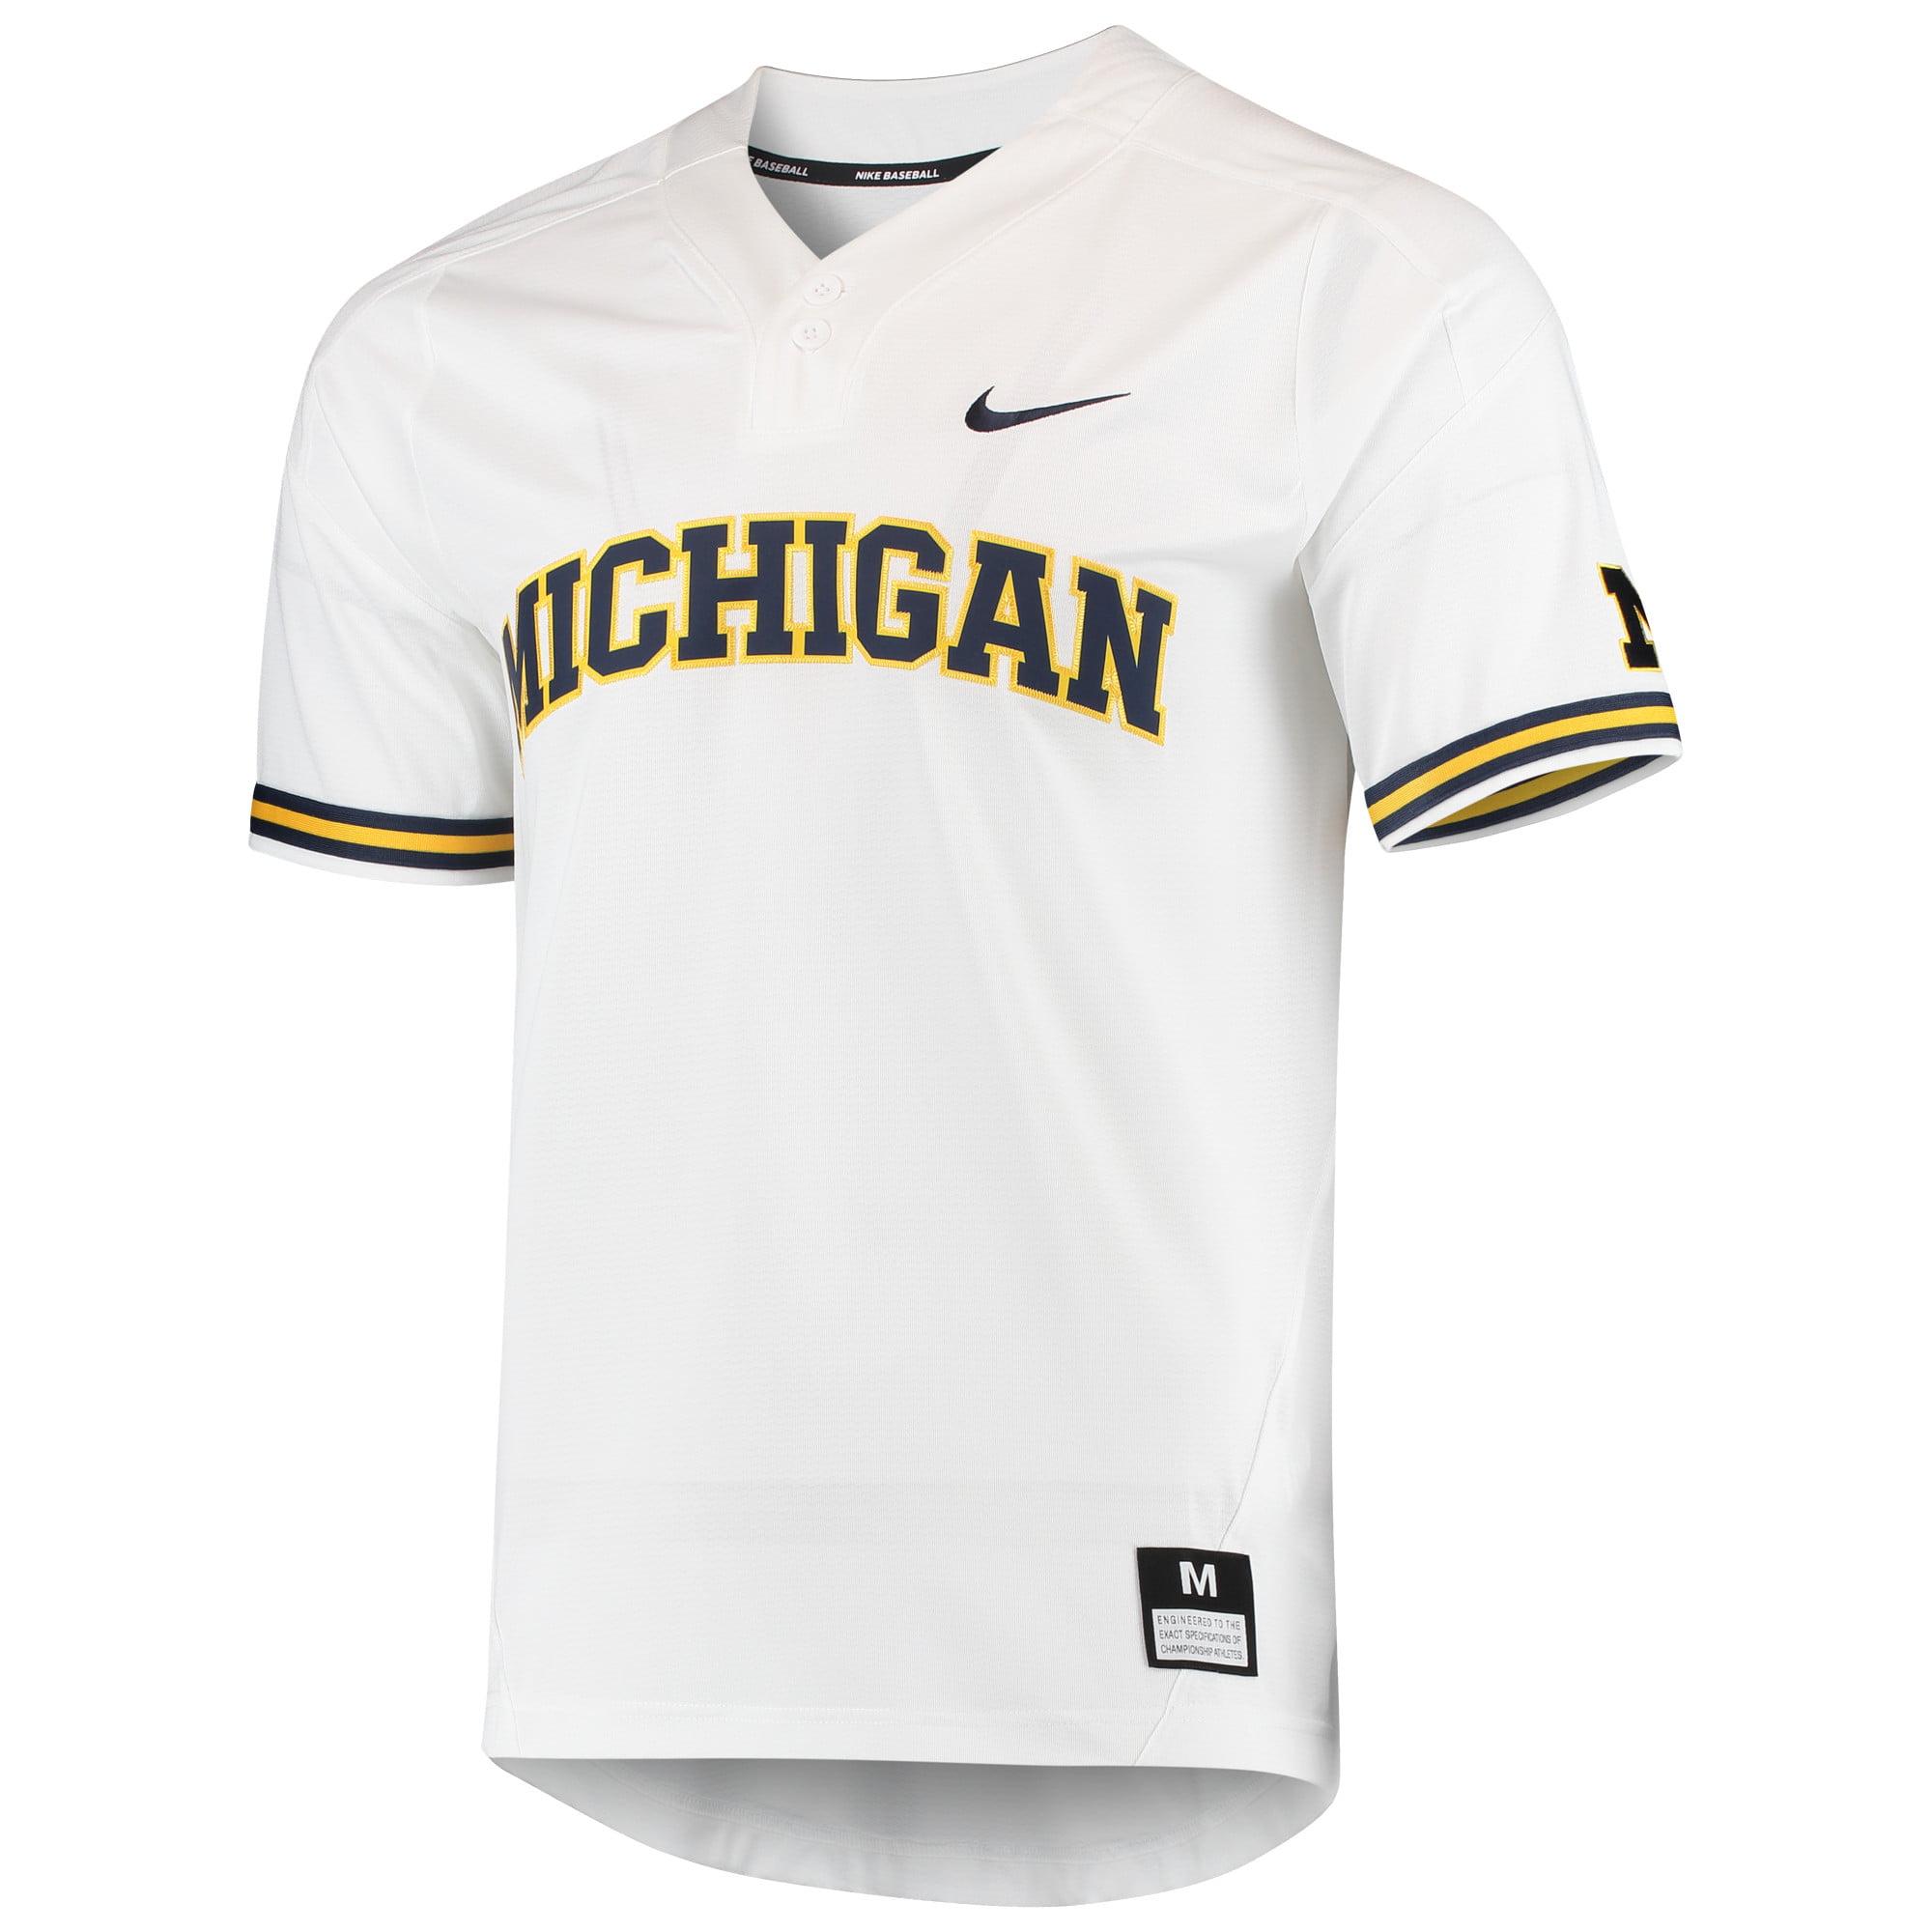 release date ecd6c 75a93 Michigan Wolverines Nike Vapor Untouchable Elite Two-Button Replica  Baseball Jersey - White